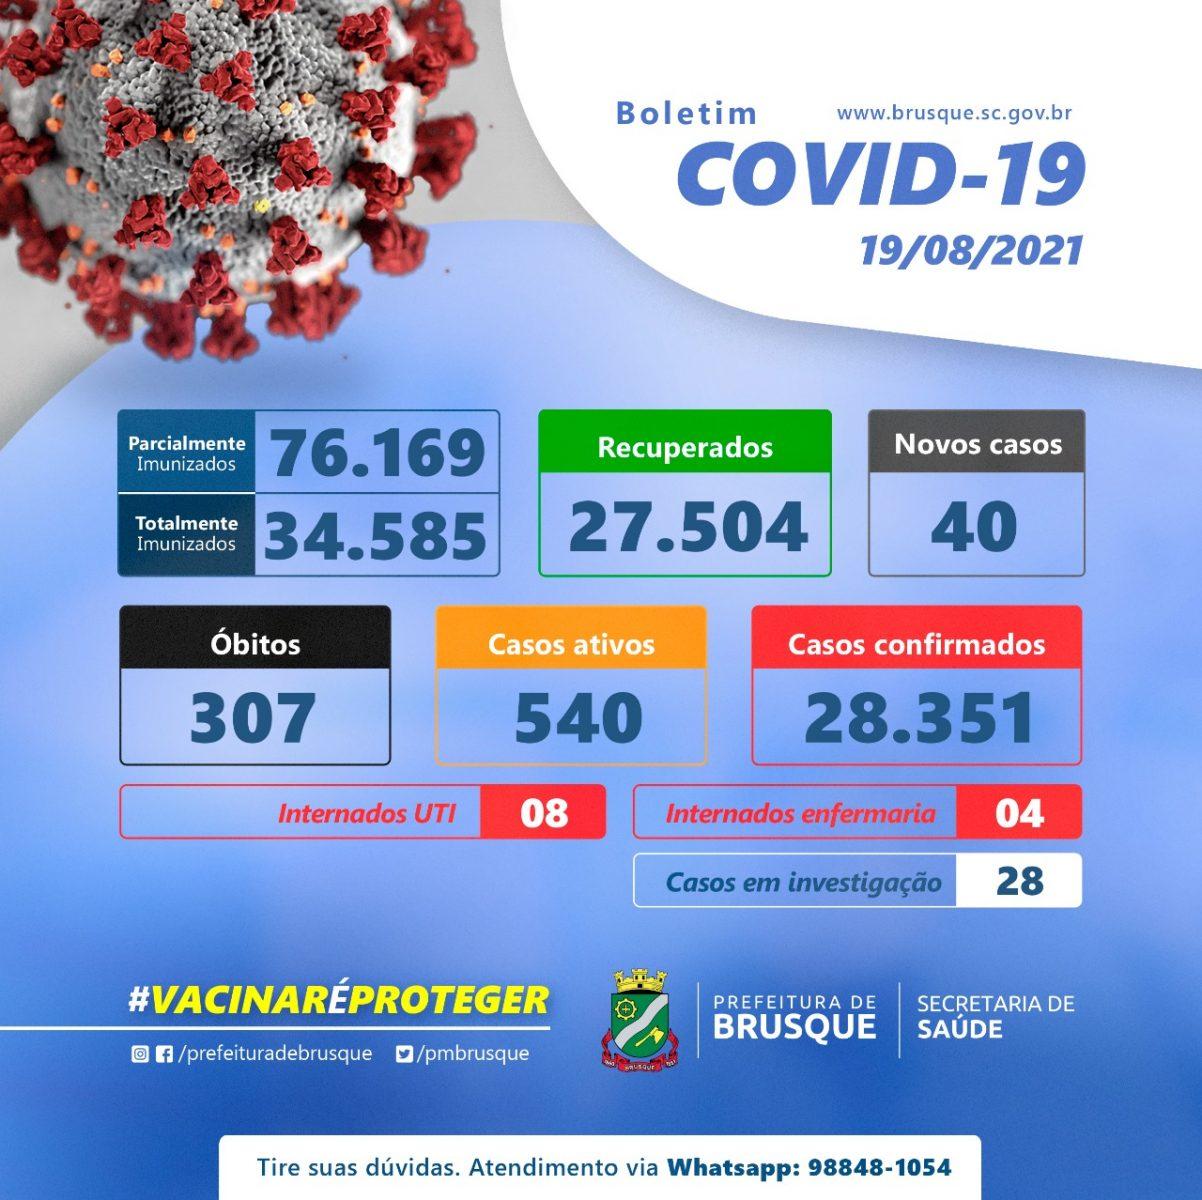 Covid-19: Confira o boletim epidemiológico desta quinta-feira (19)